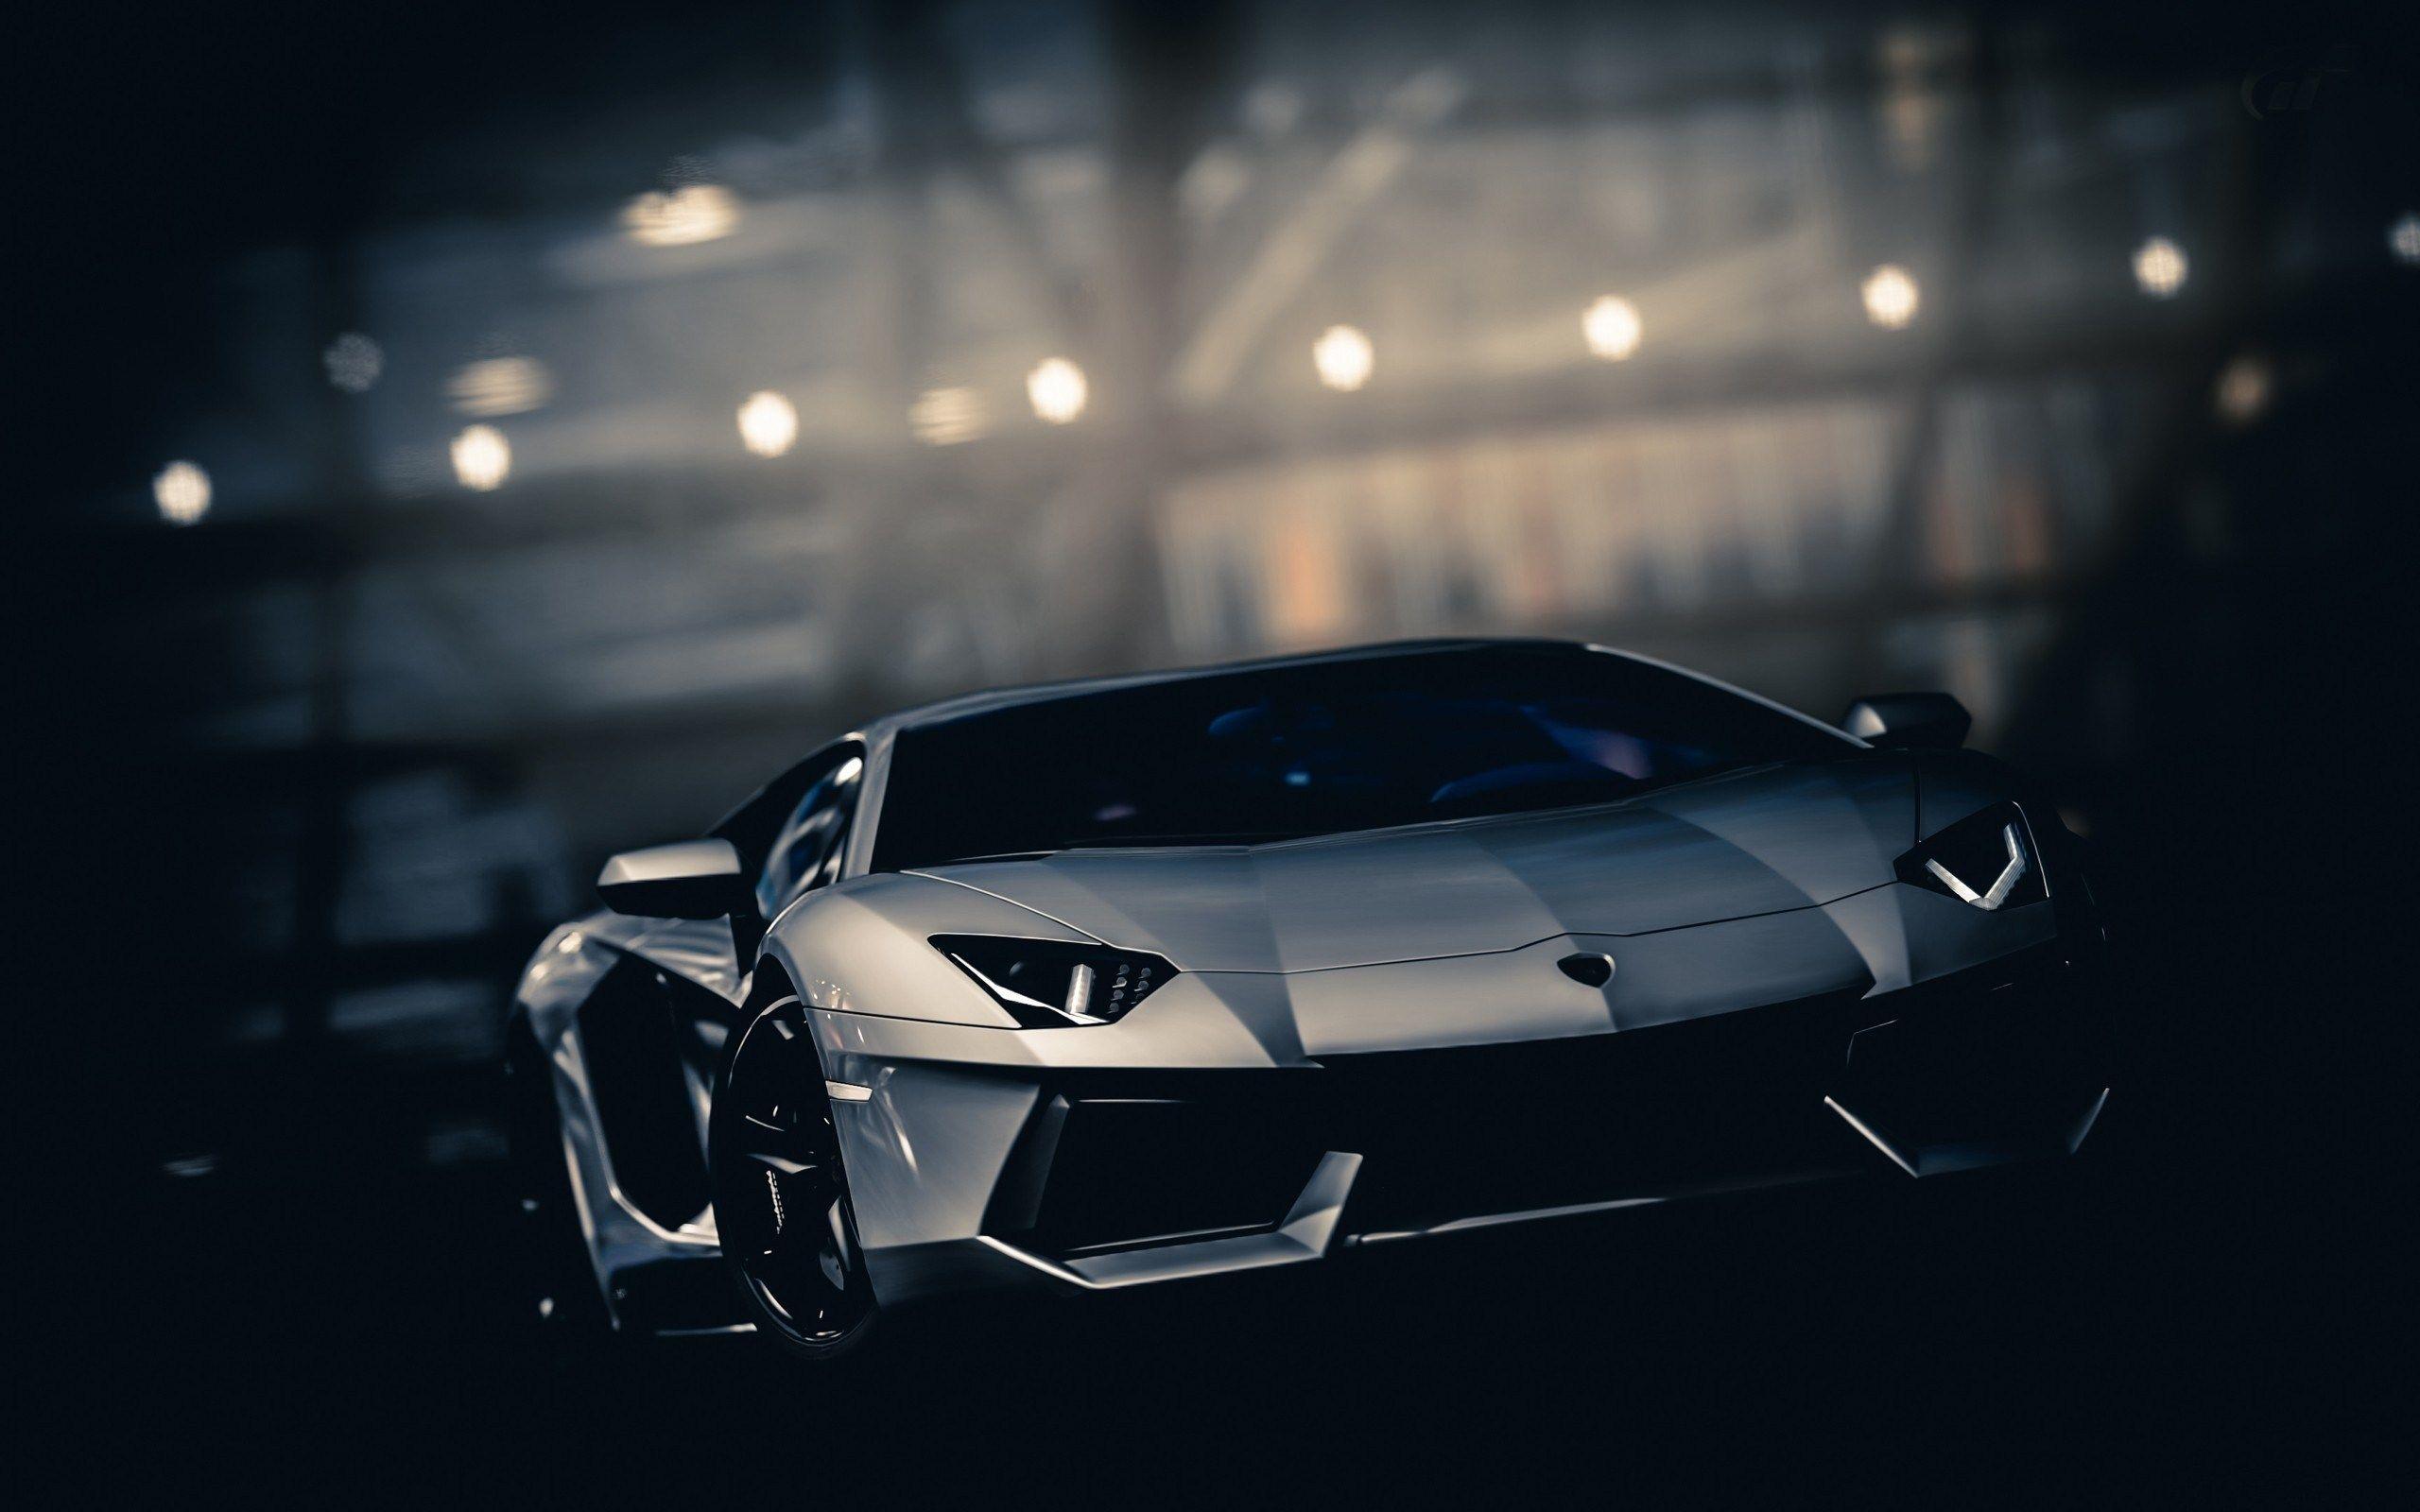 lamborghini aventador lamborghini aventador wallpaper hd - Lamborghini Aventador Roadster Wallpaper Hd 19201080